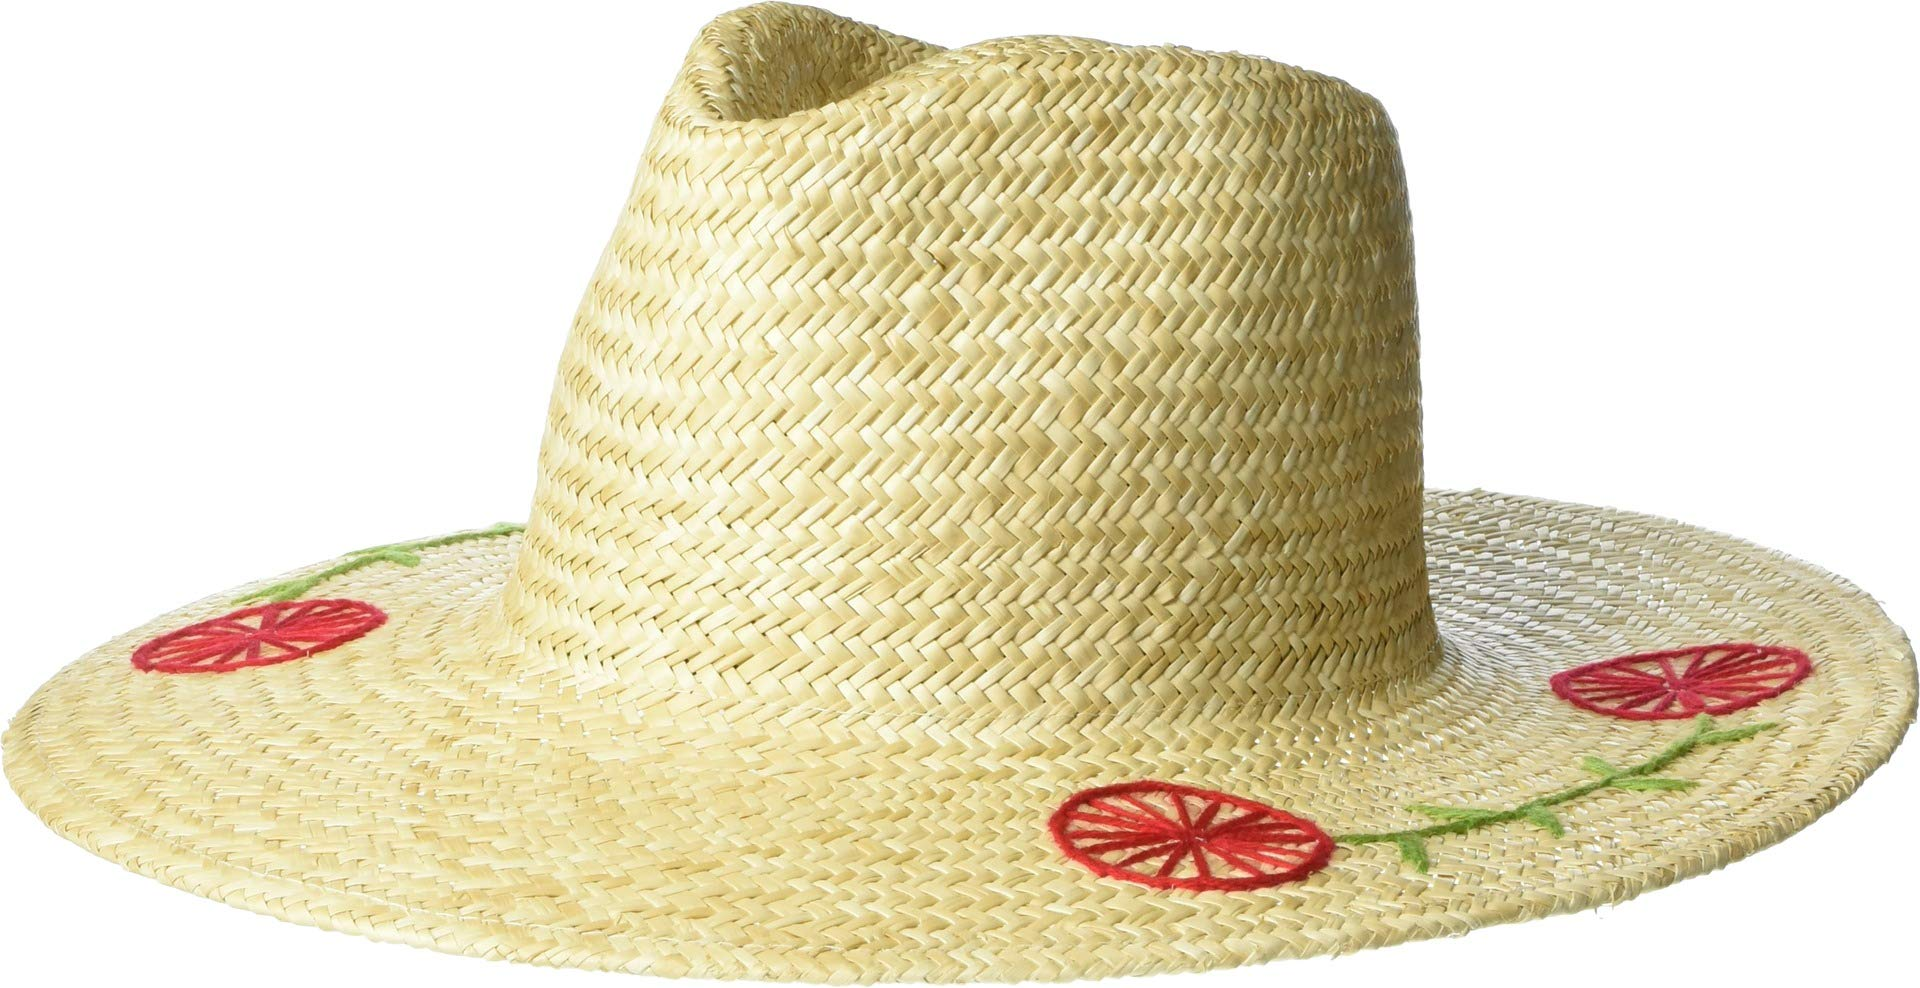 Brixton Women's Joanna Embroidered Hat Tan SM (7)